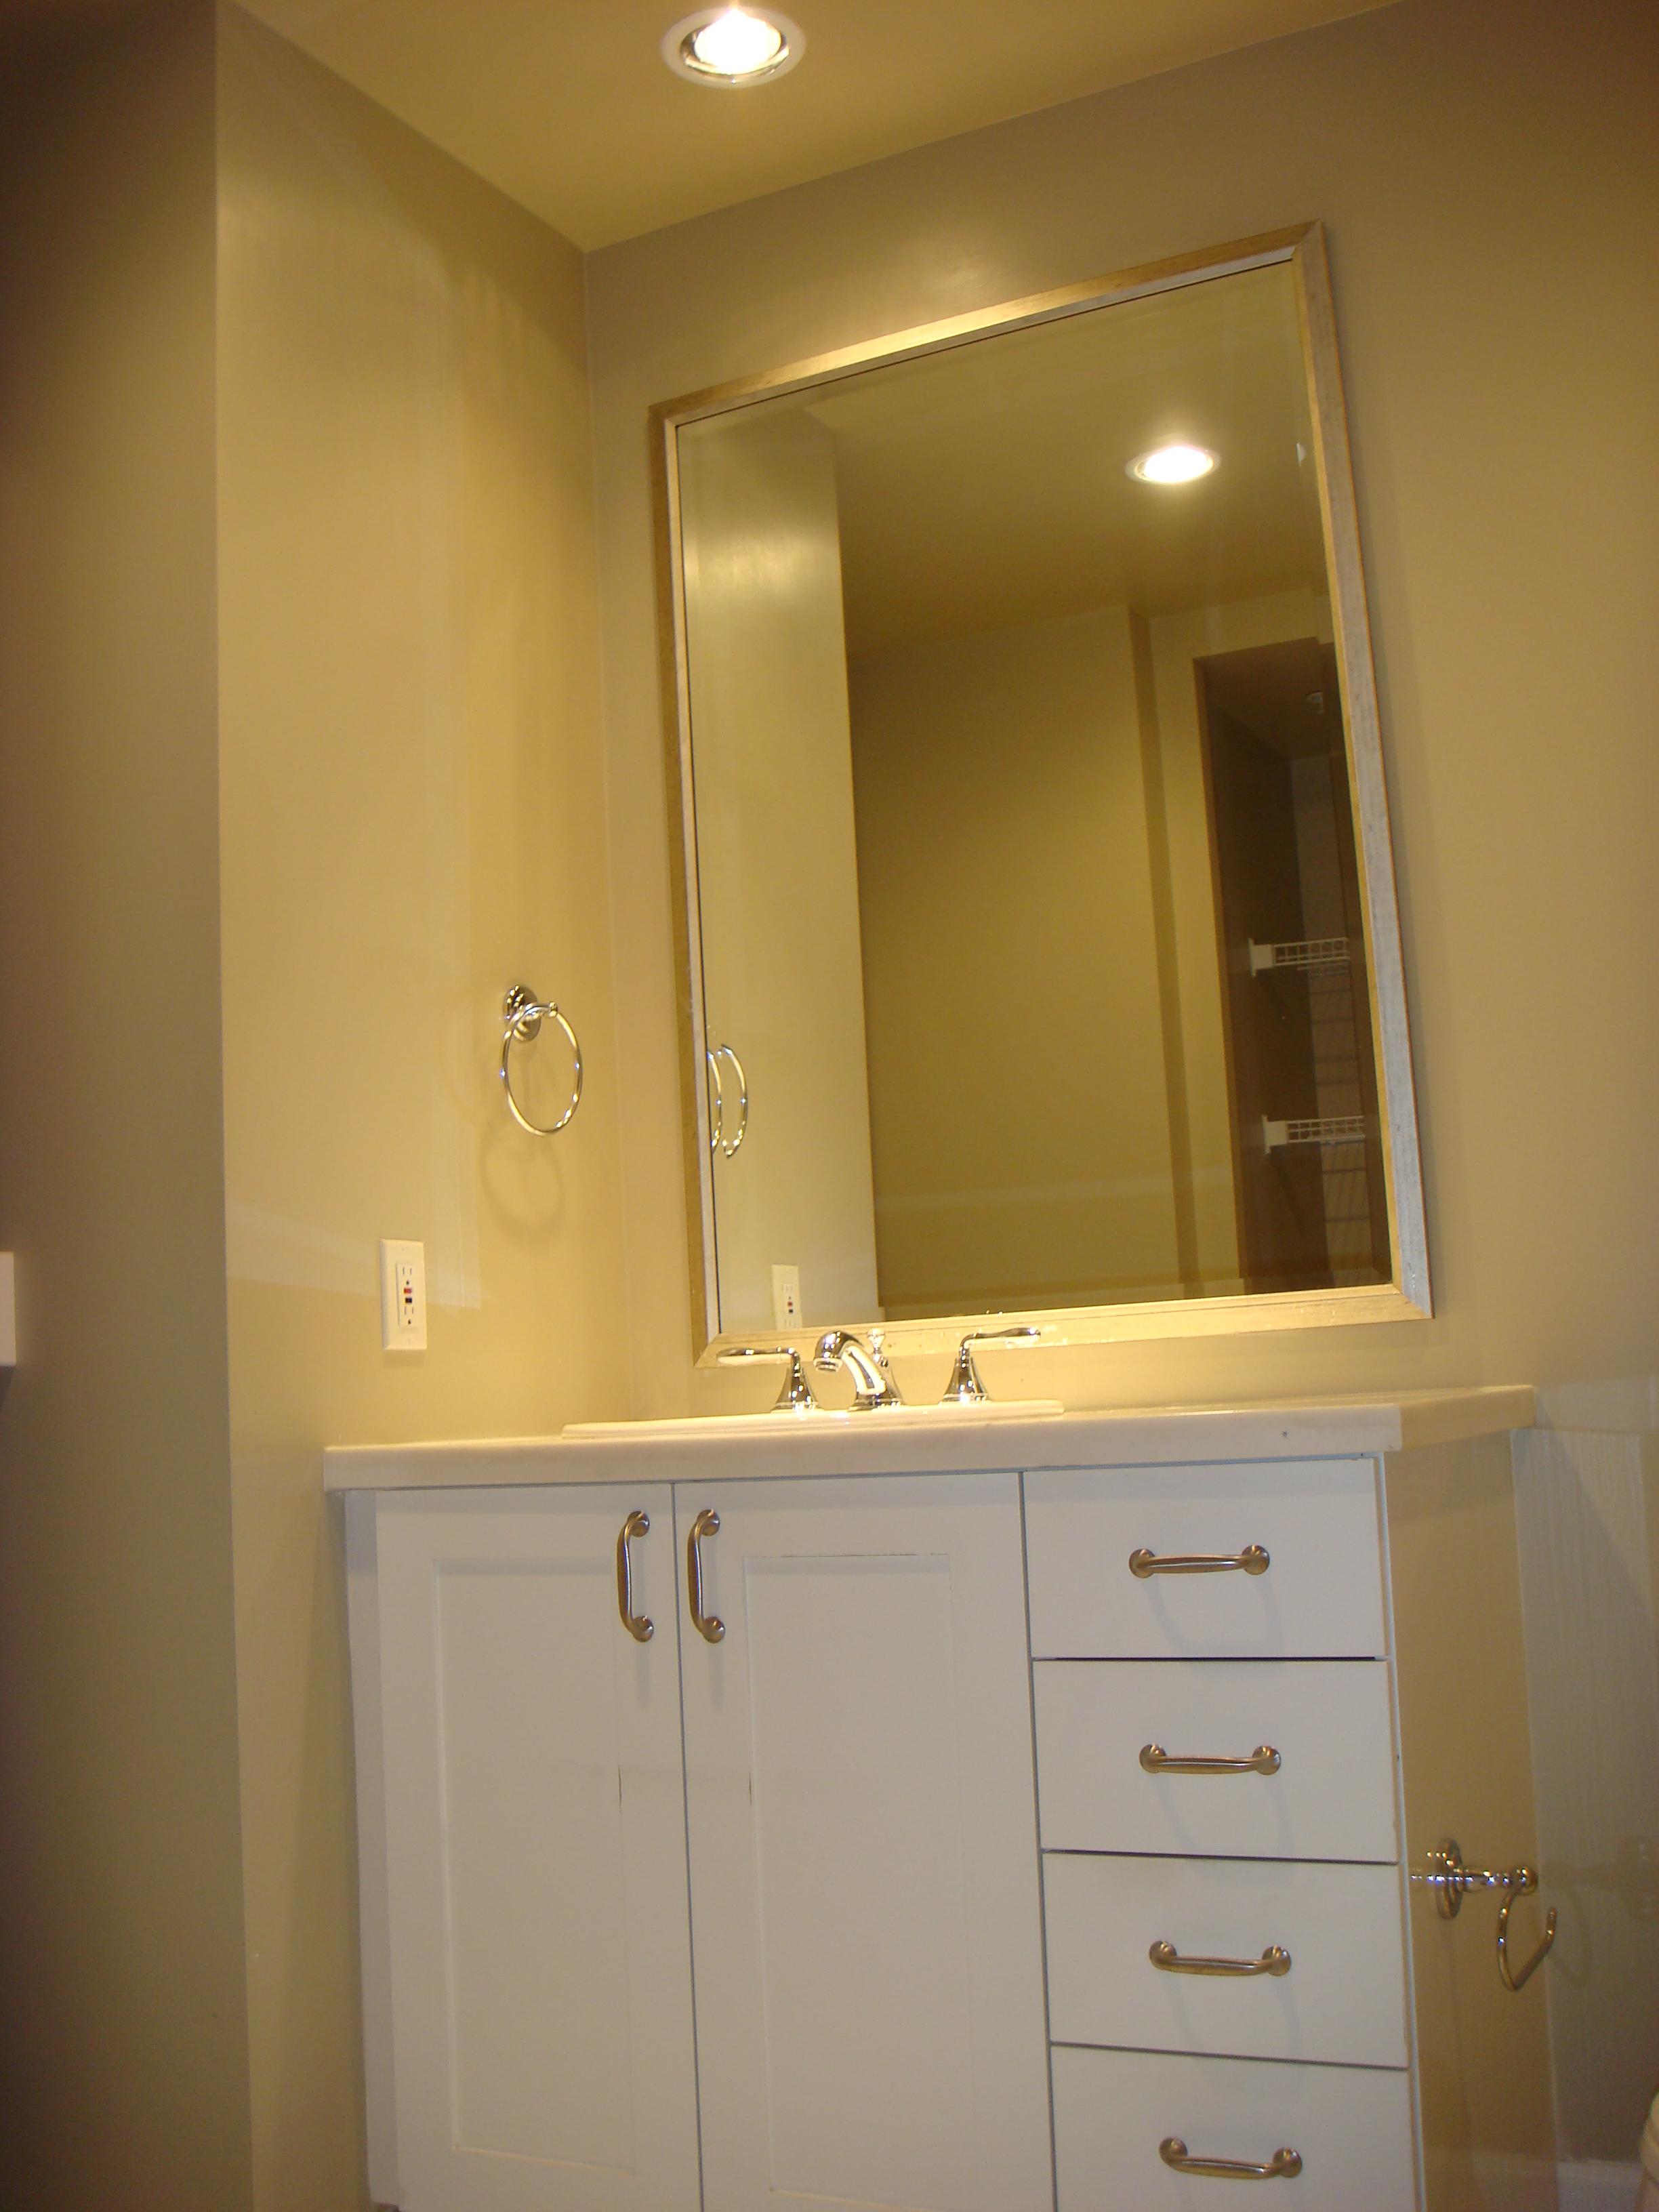 Bathroom Lighting Vancouver 308-170 west 1st street, 2 bed 2 bath - vista realty - property